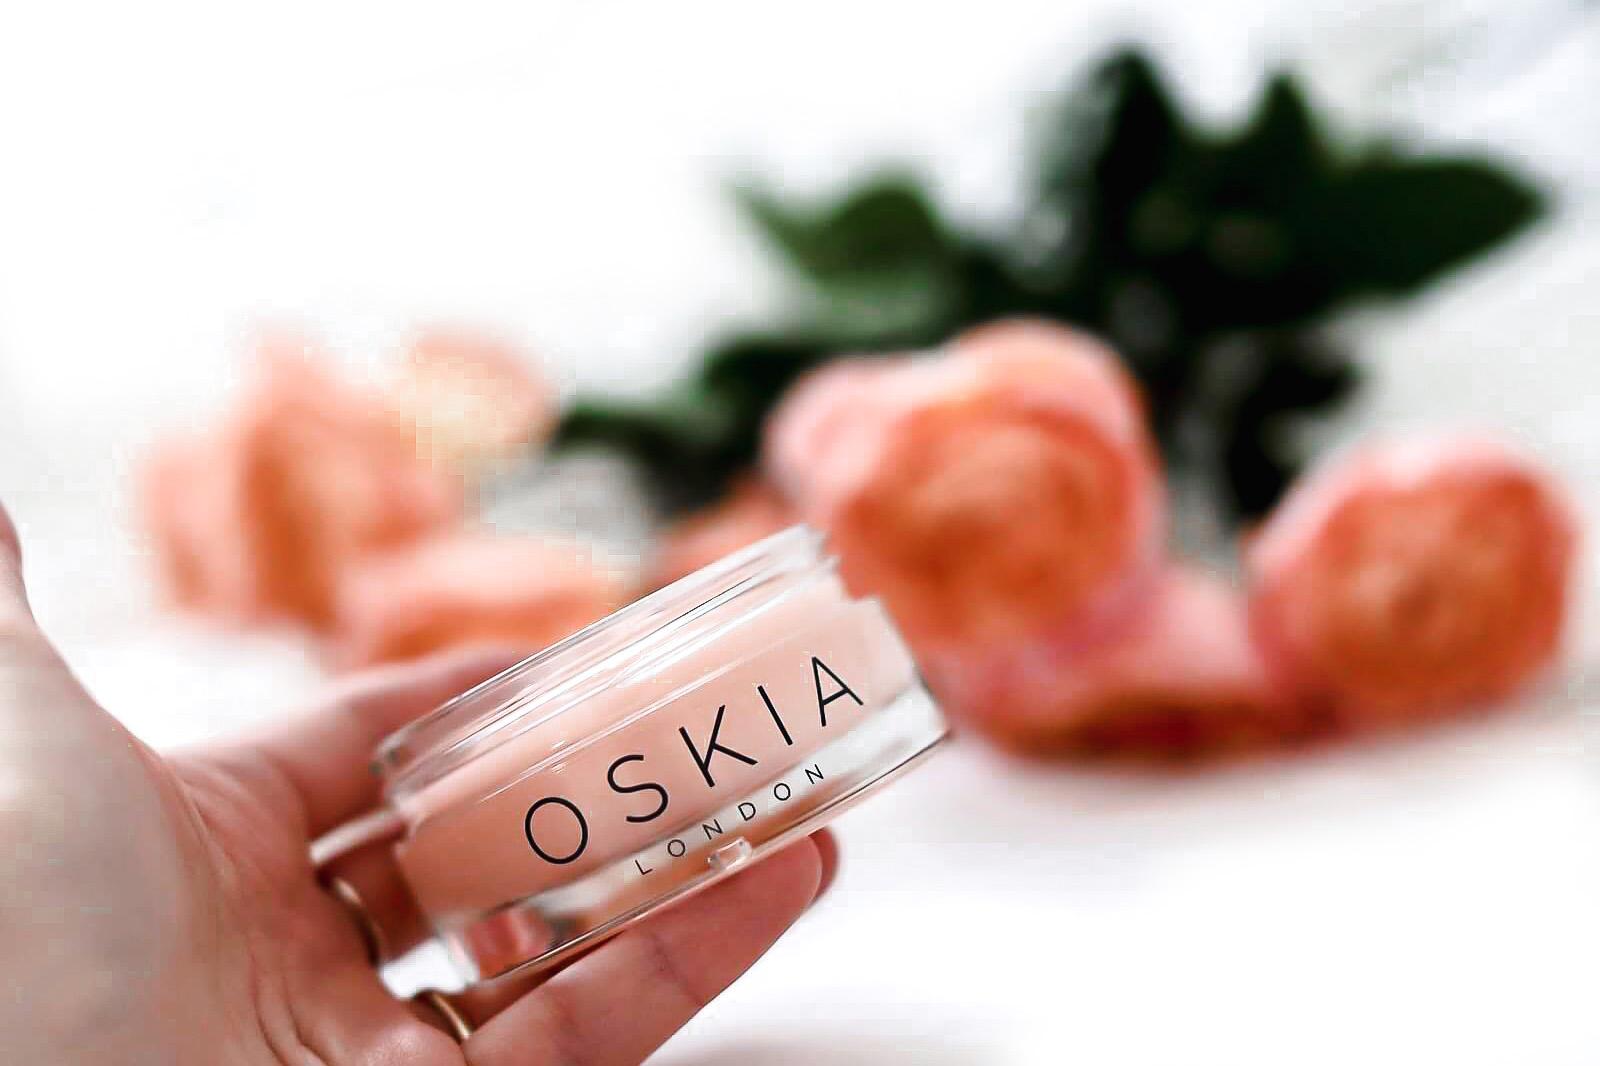 oskia-skin-care-masque-resurfaçant-renaissance-avis-test-compoition-liste-INCI